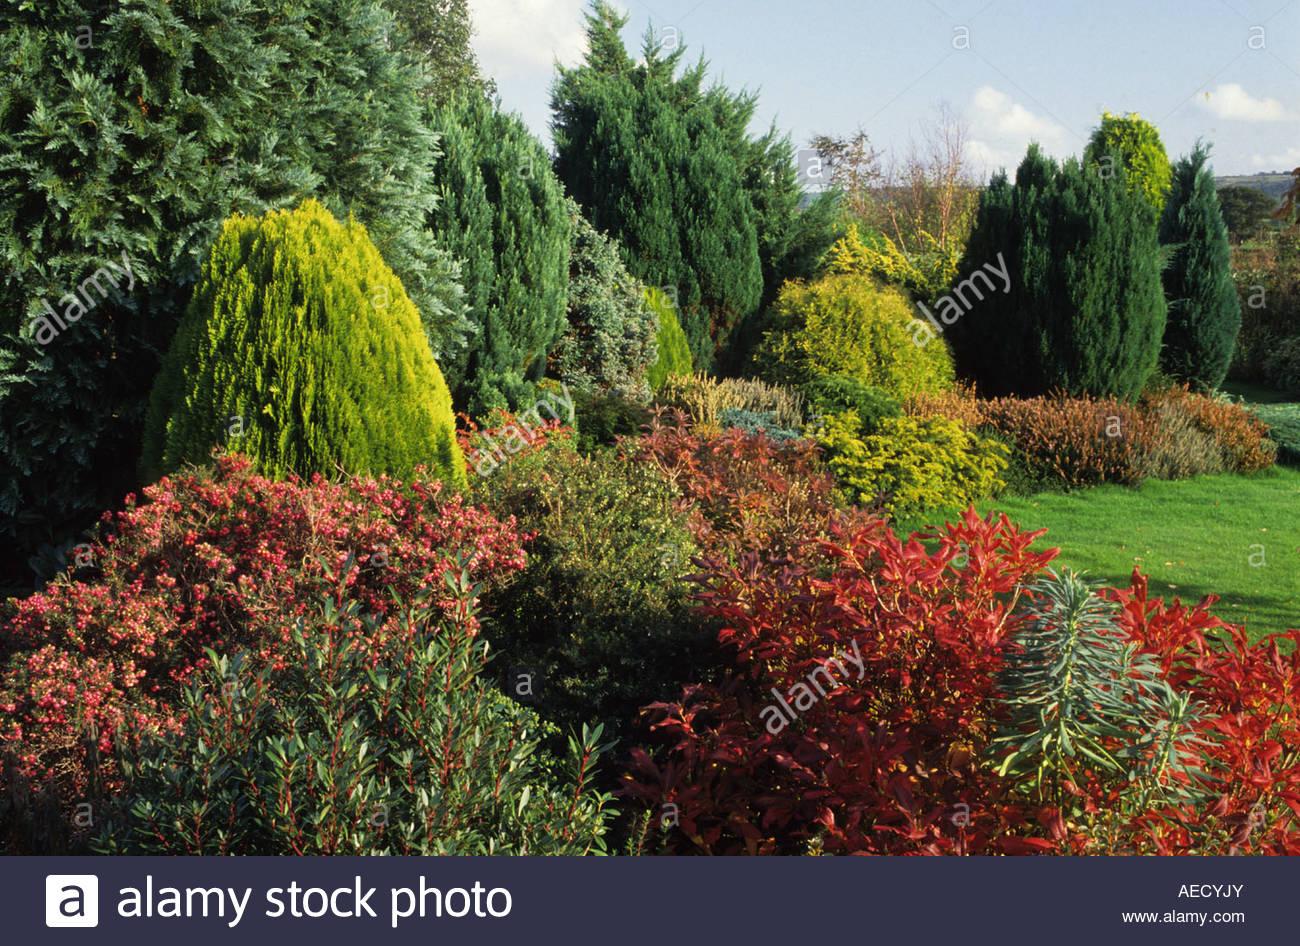 broadlands dorset low maintenance conifers and shrubs in autumn